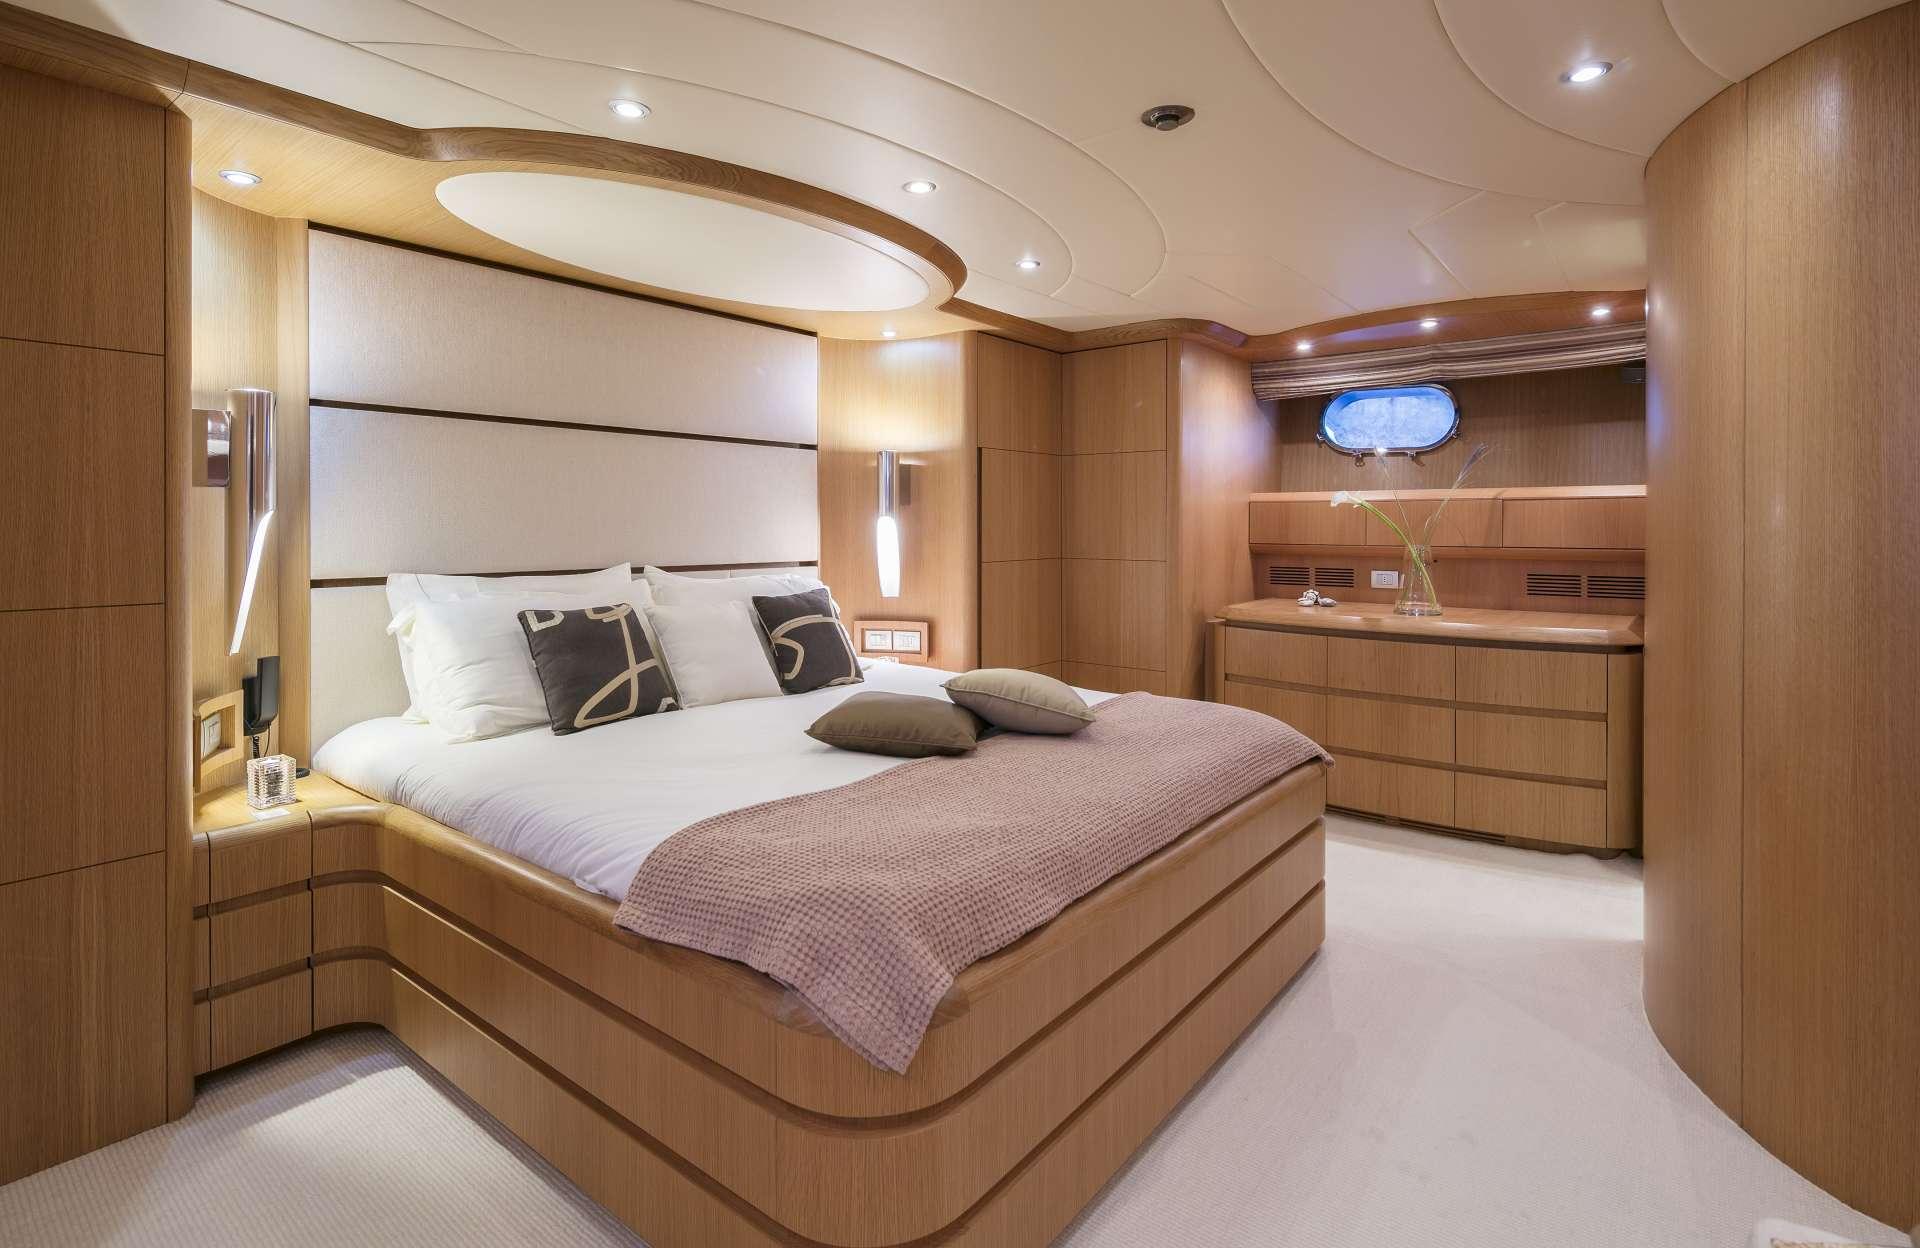 Motor Yacht 'PARIS A' VIP Suite 1, 12 PAX, 6 Crew, 115.00 Ft, 35.06 Meters, Built 2009, Majora, Refit Year 2013